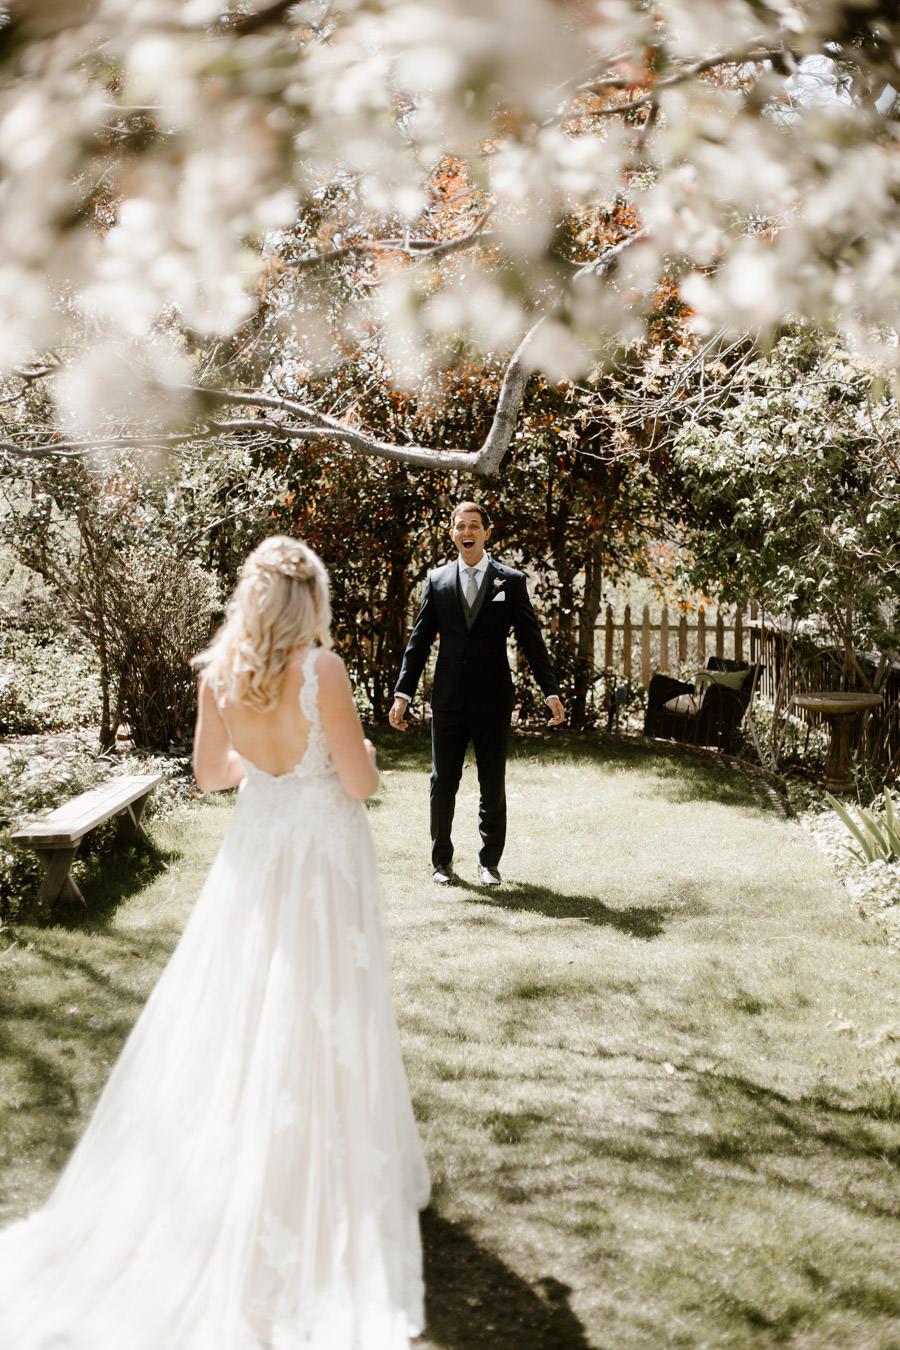 sacred mountain julian wedding first look moment first reaction